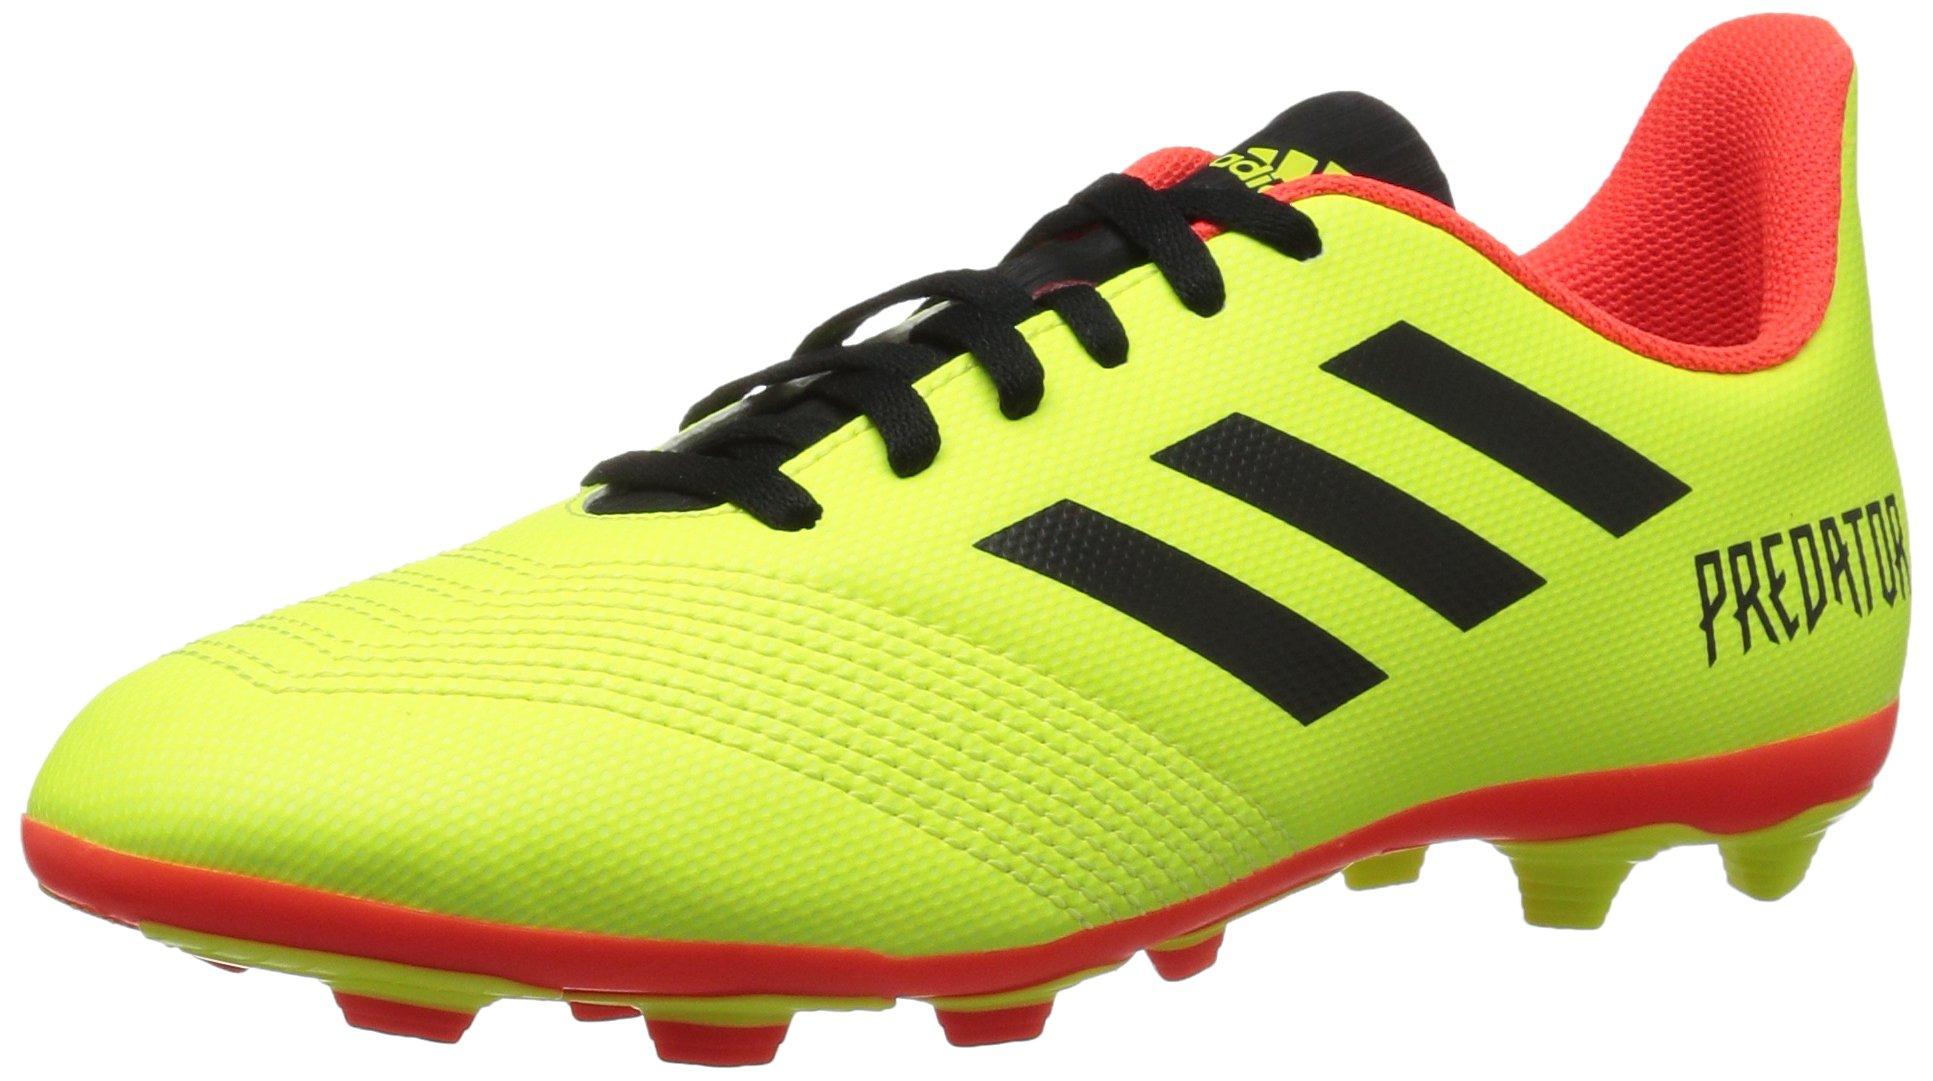 adidas Unisex-Kids Predator 18.4 Firm Ground Soccer Shoe, Solar Yellow/Black/Solar Red, 3.5 M US Big Kid